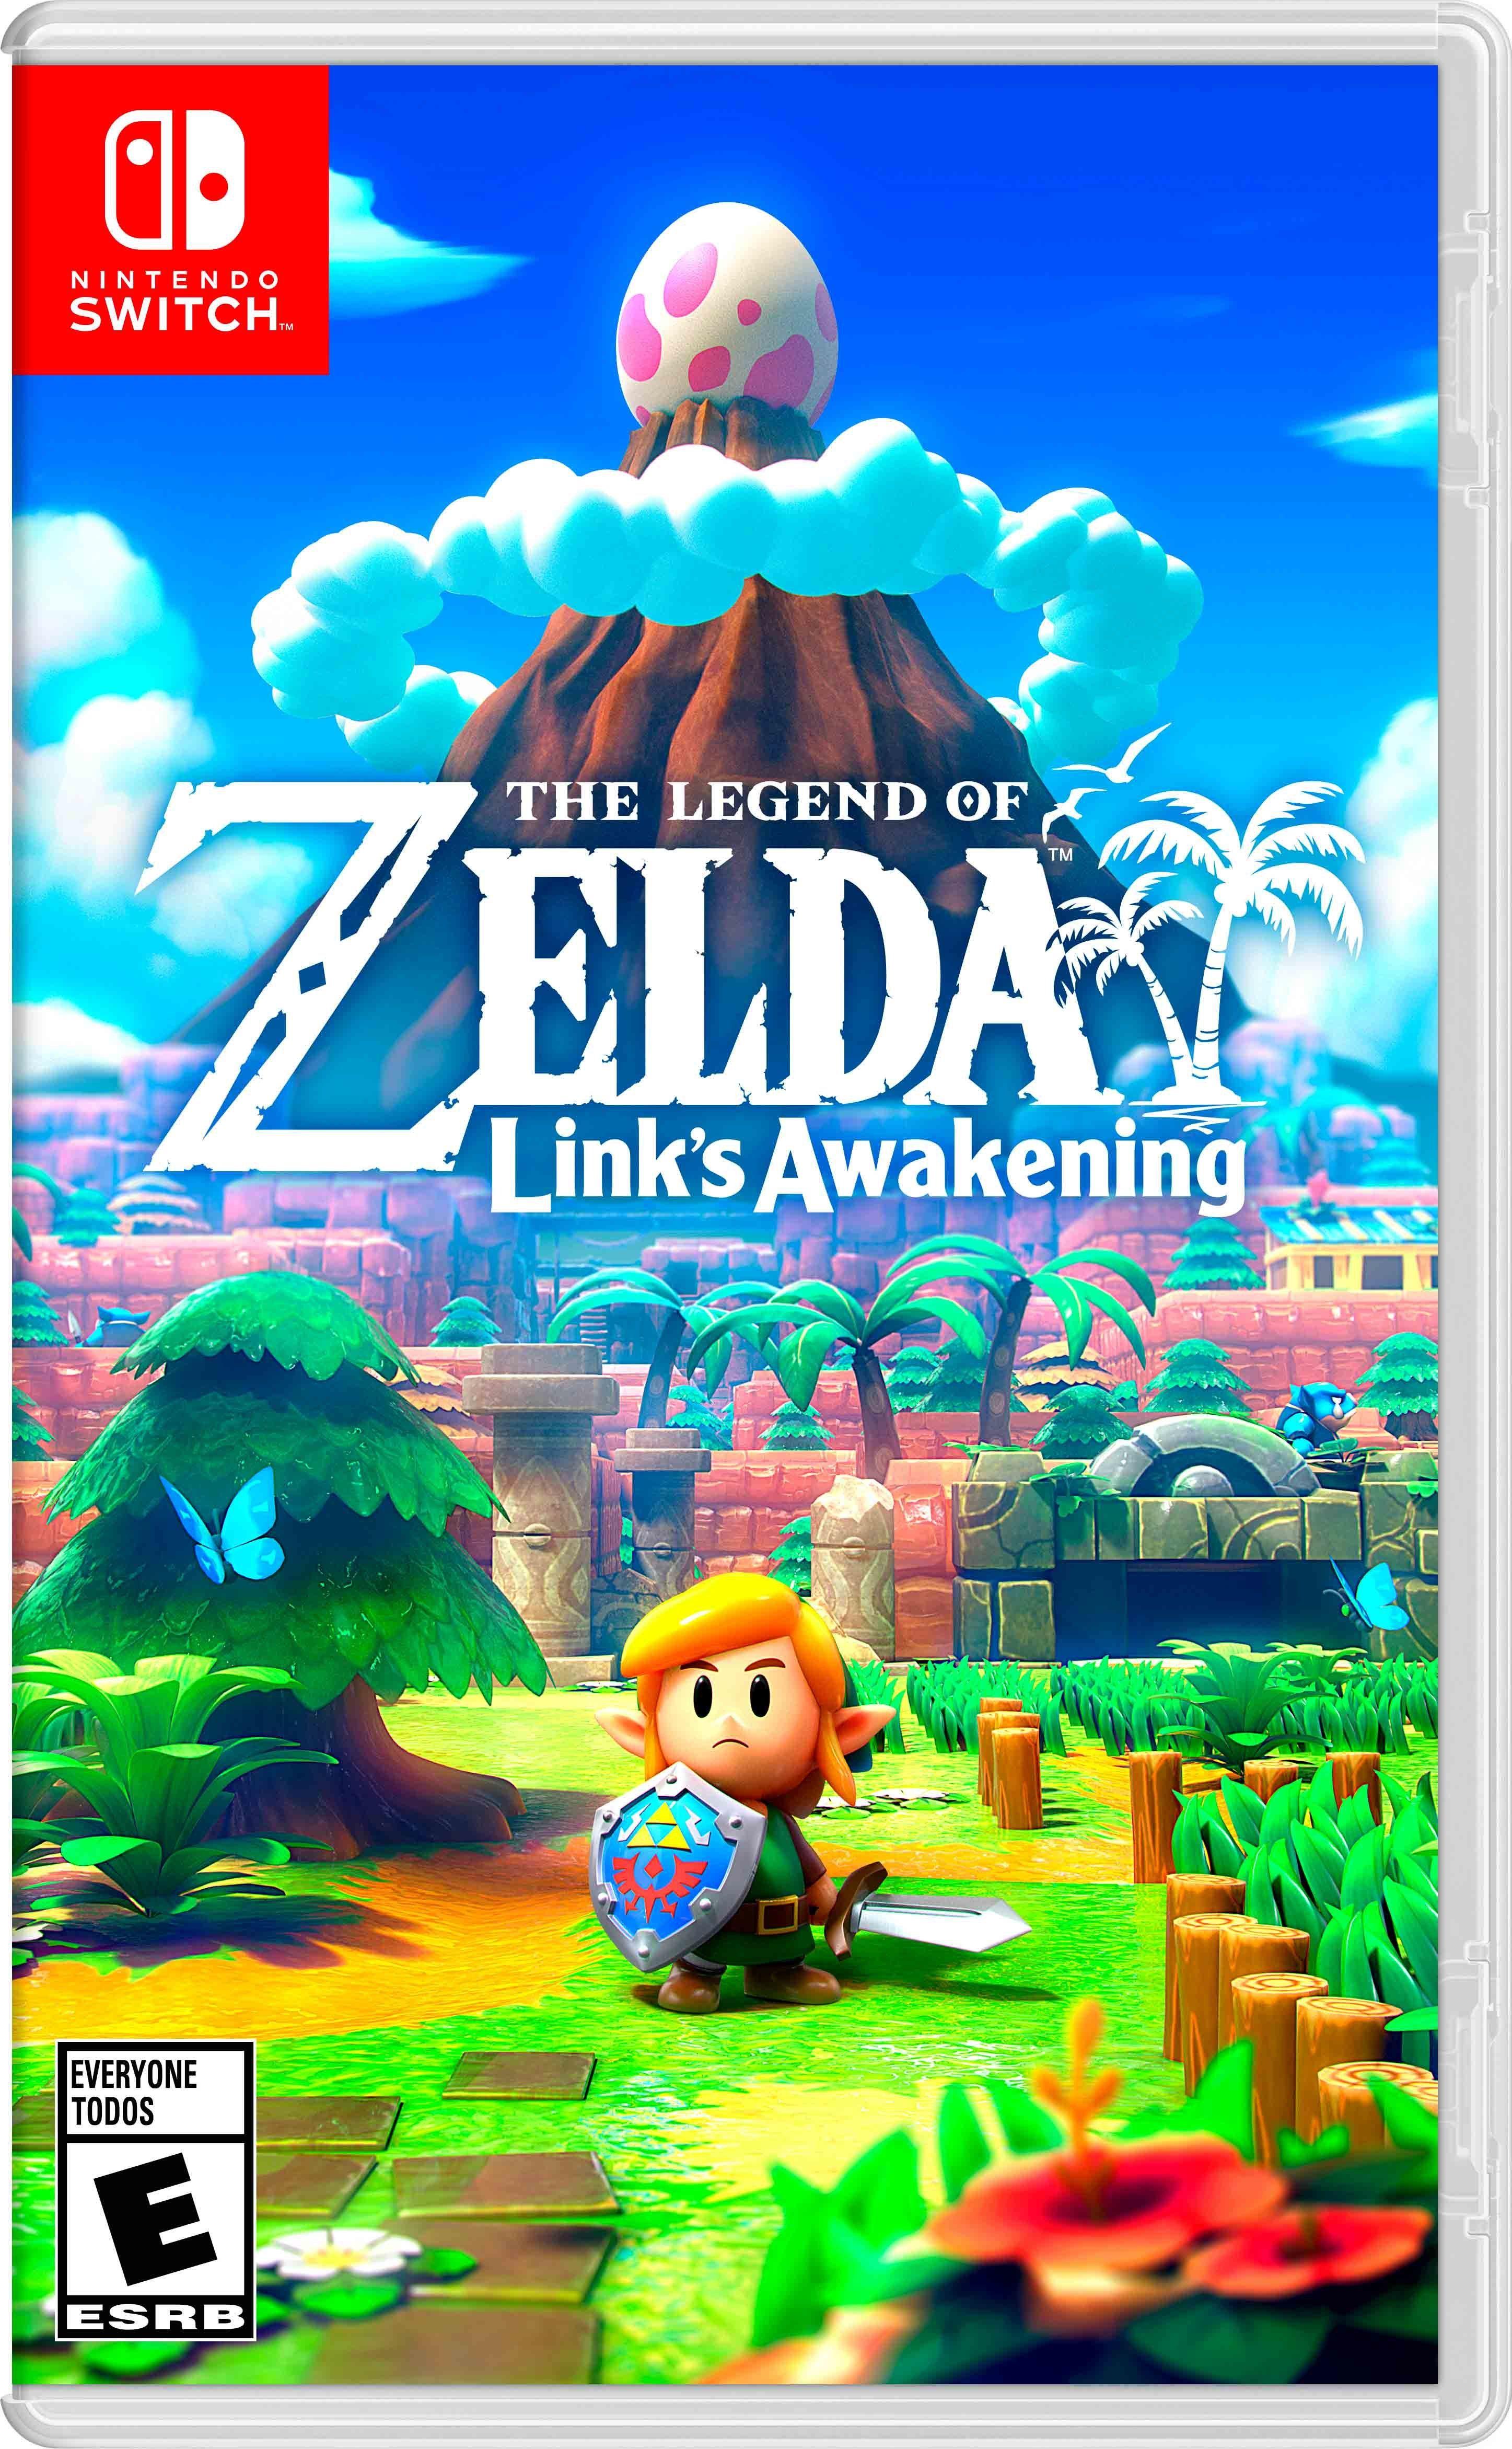 Zelda video game box art.